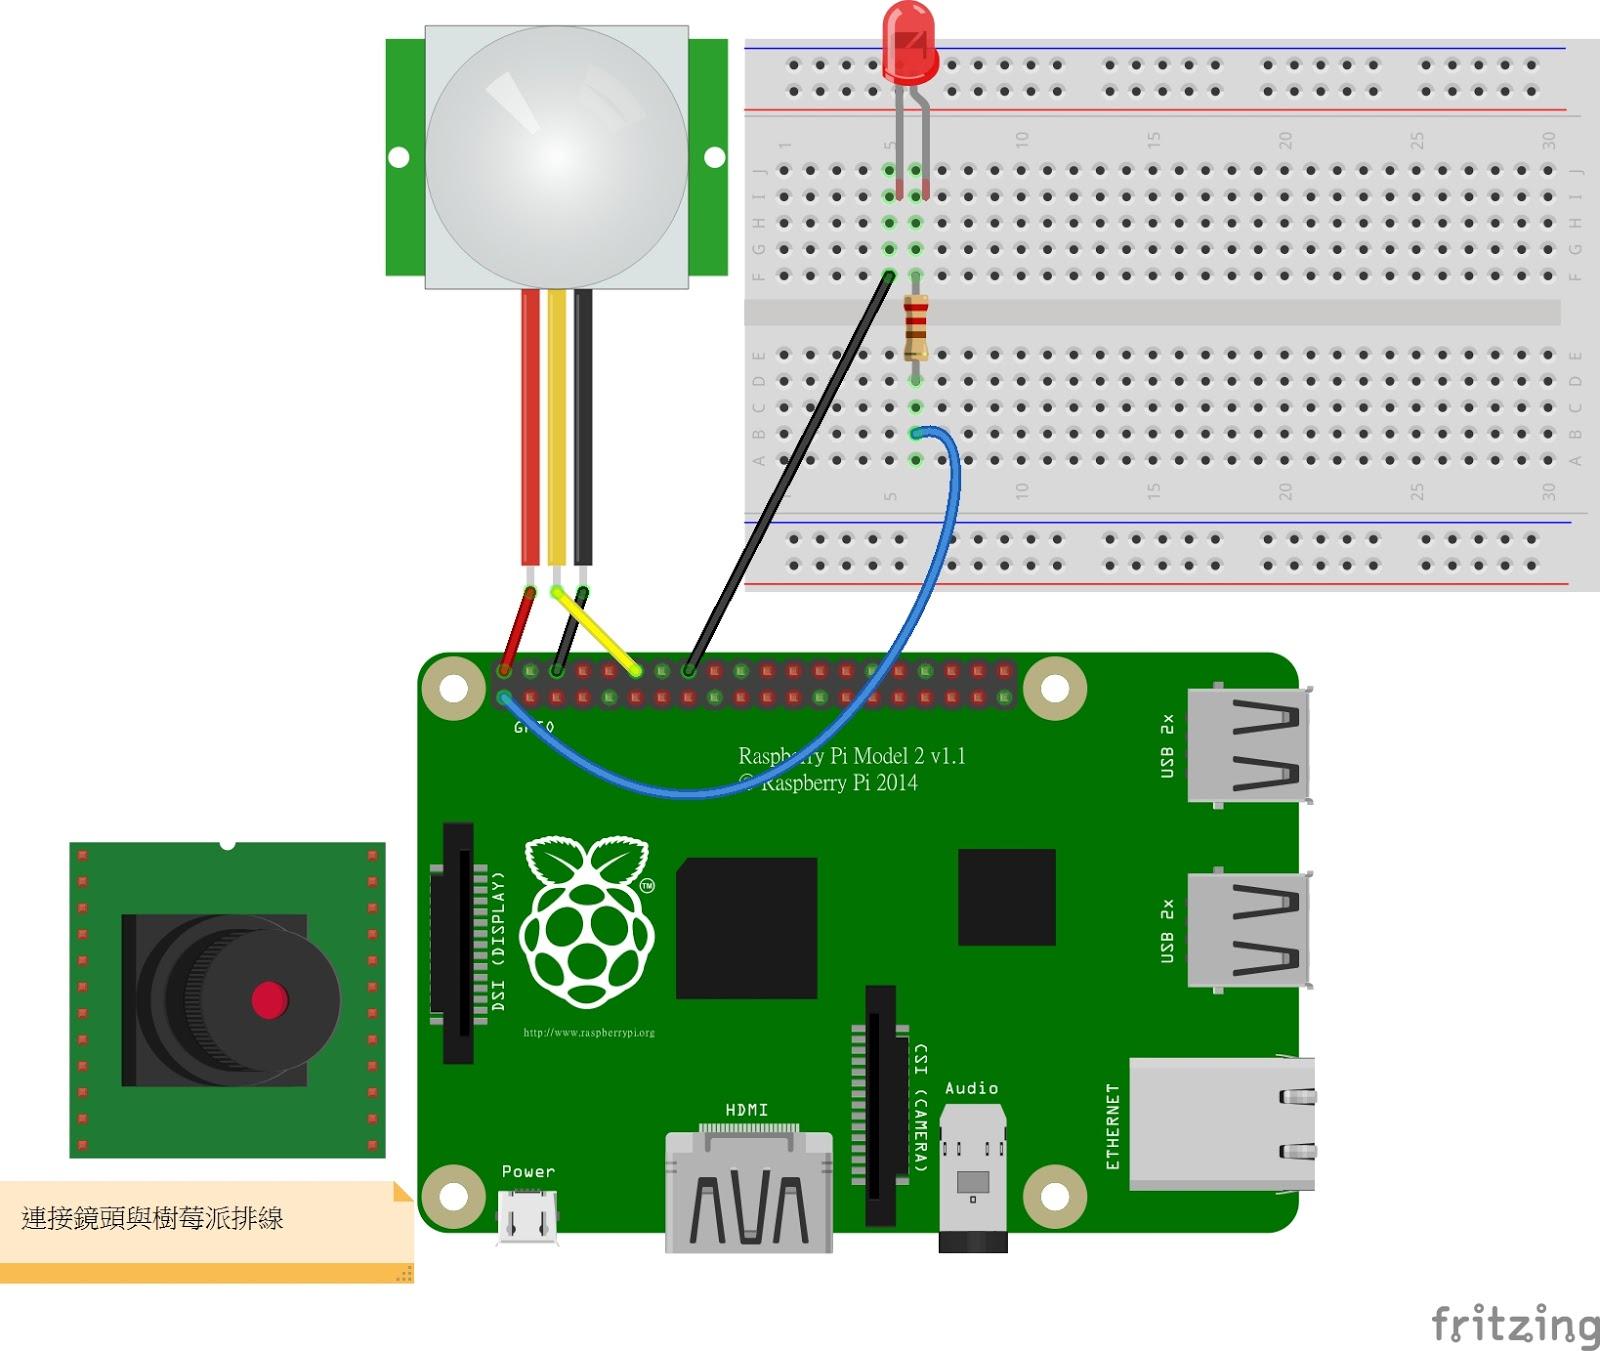 Raspberry Pi 筆記(71):HC-SR501偵測到移動物體拍照存檔   天花板隨記